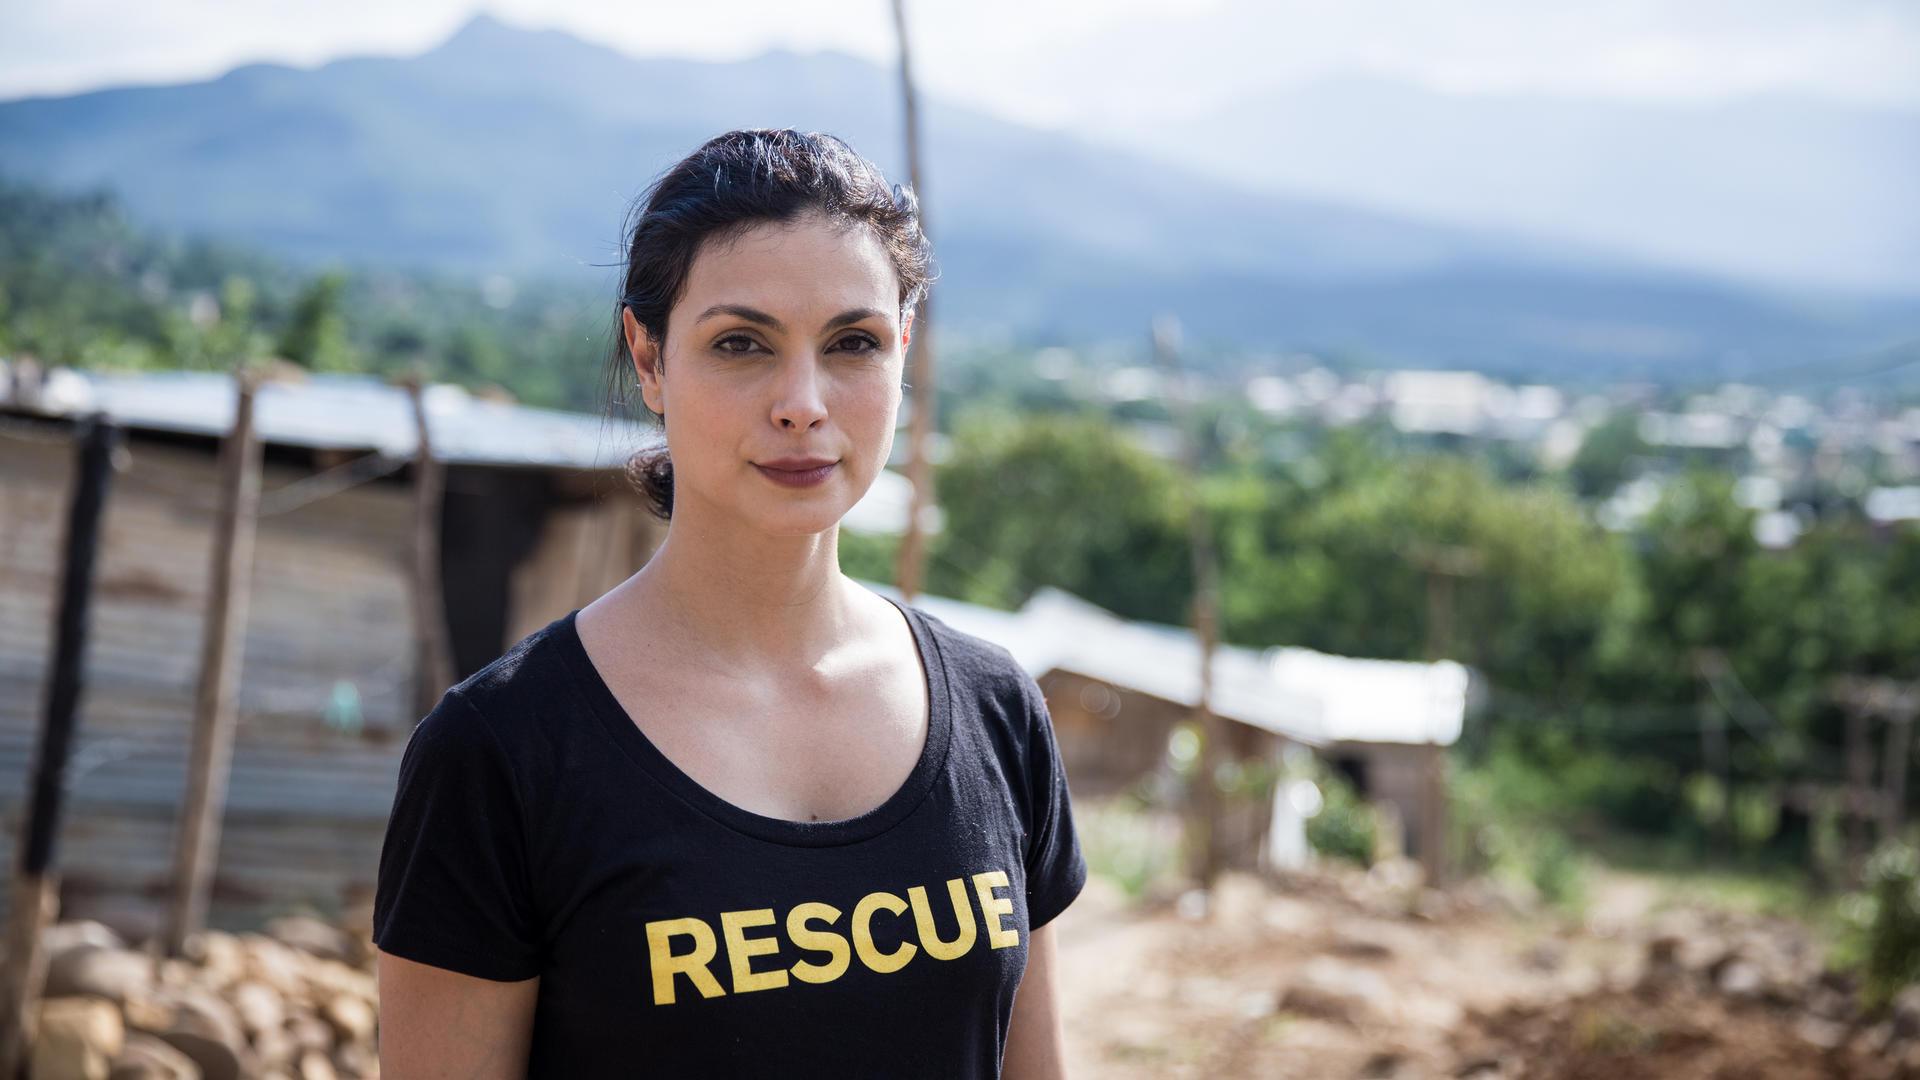 Morena Baccarin in Cucuta, Colombia